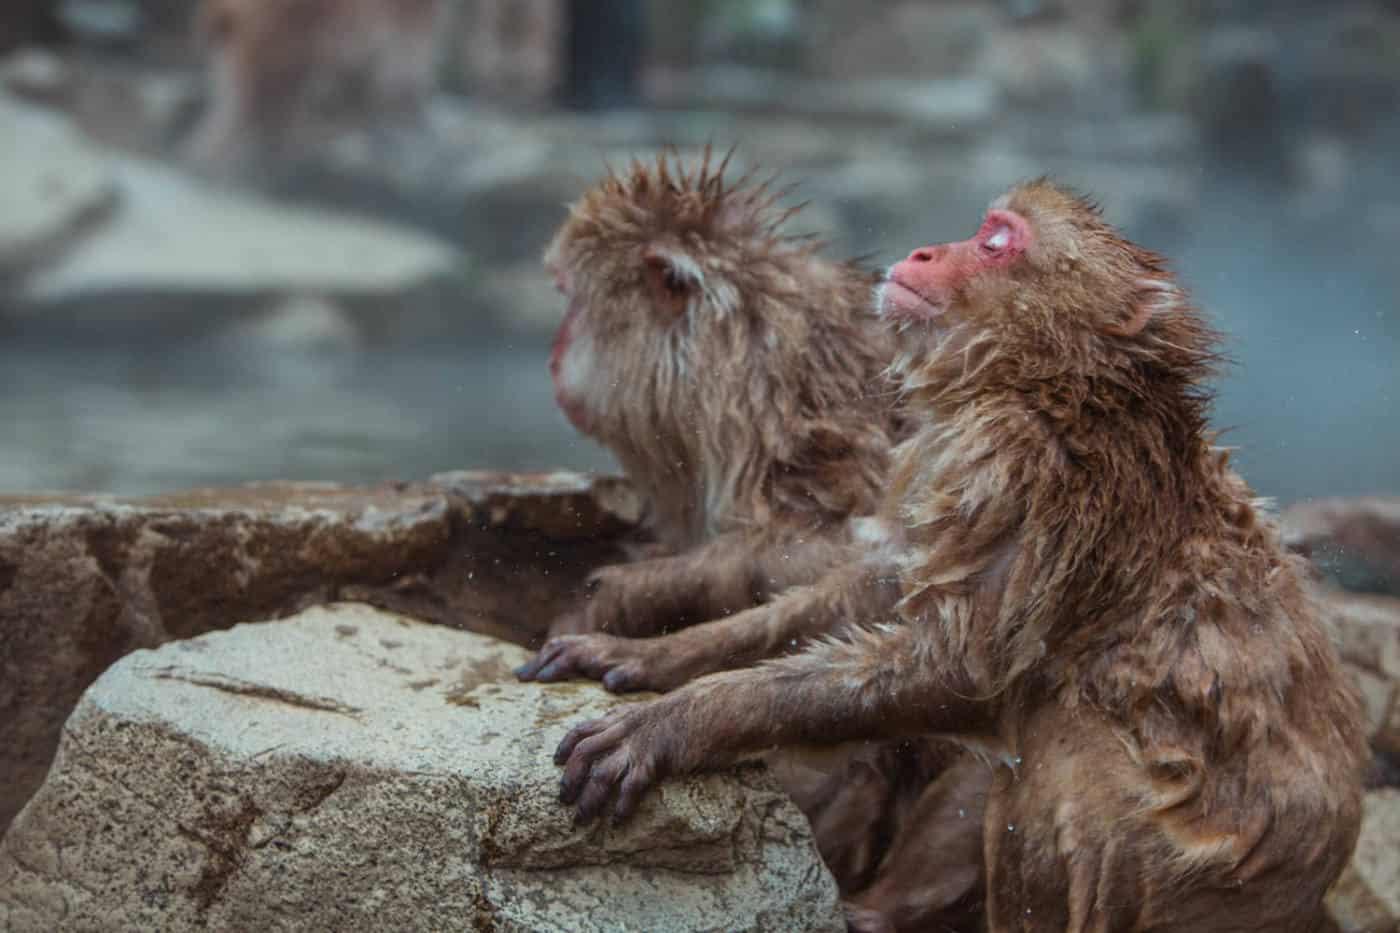 Japanese snow monkeys in hot springs at Jigokudani Monkey Park